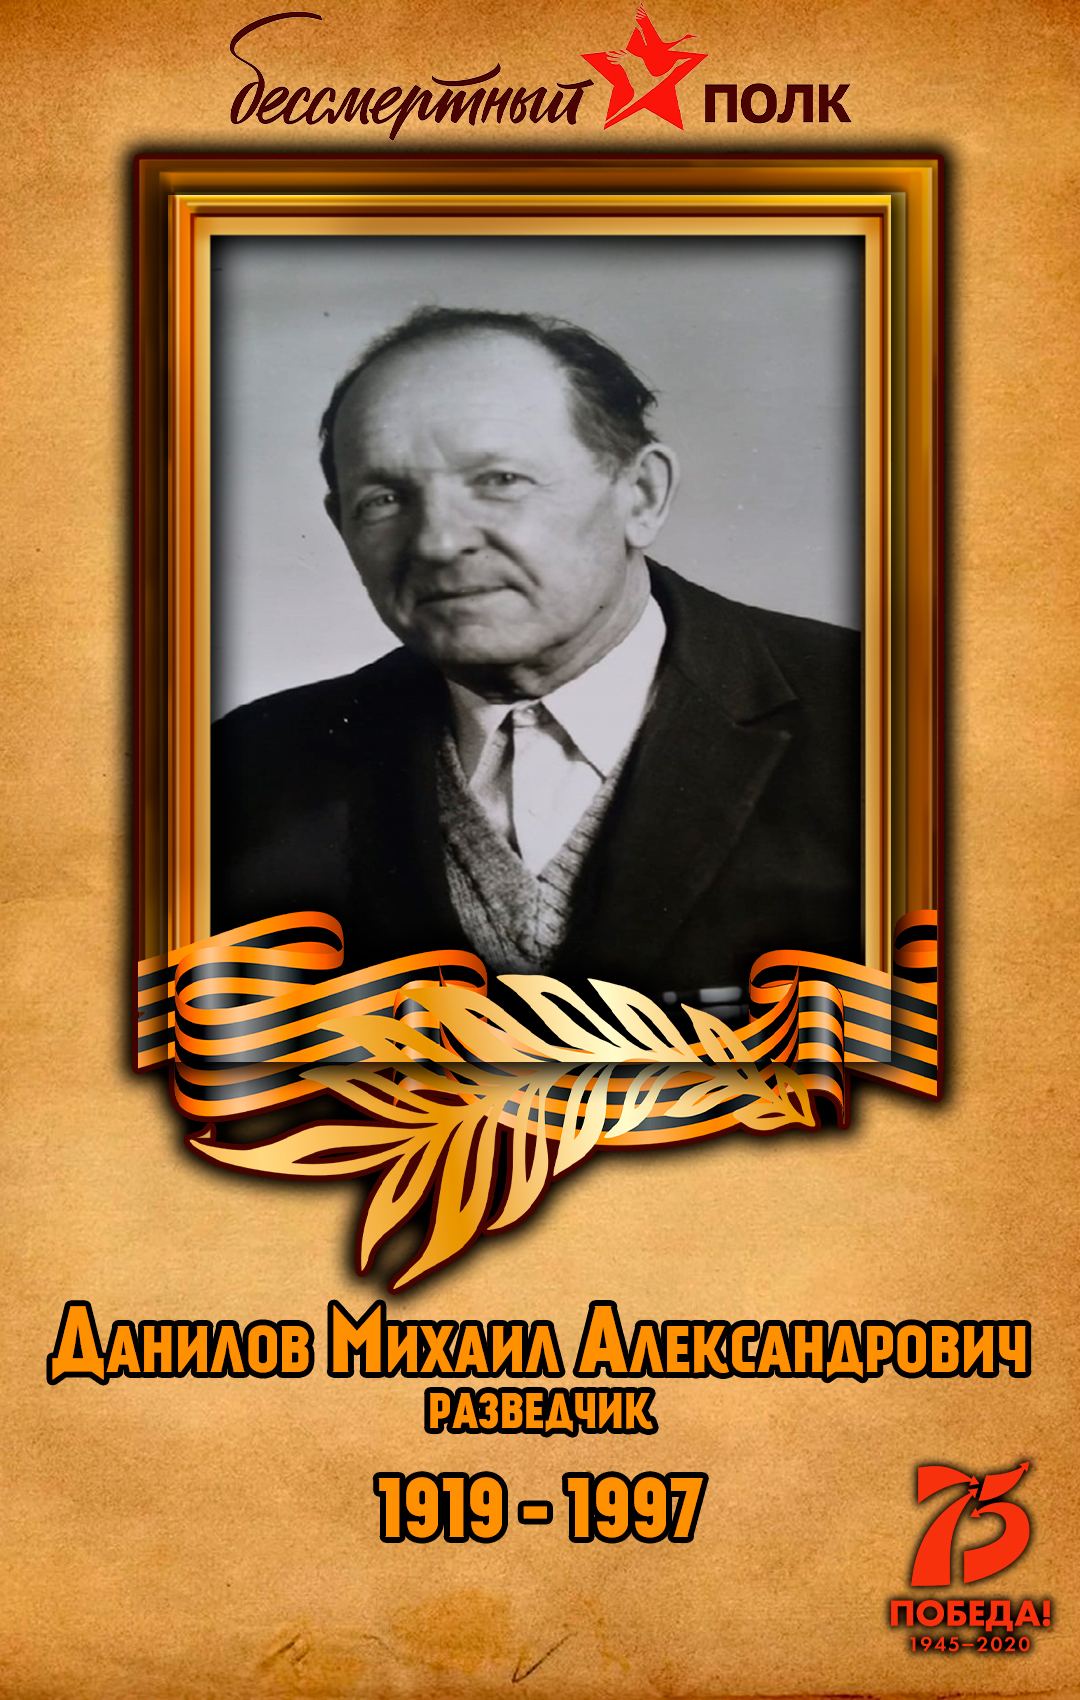 Данилов-Михаил-Александрович